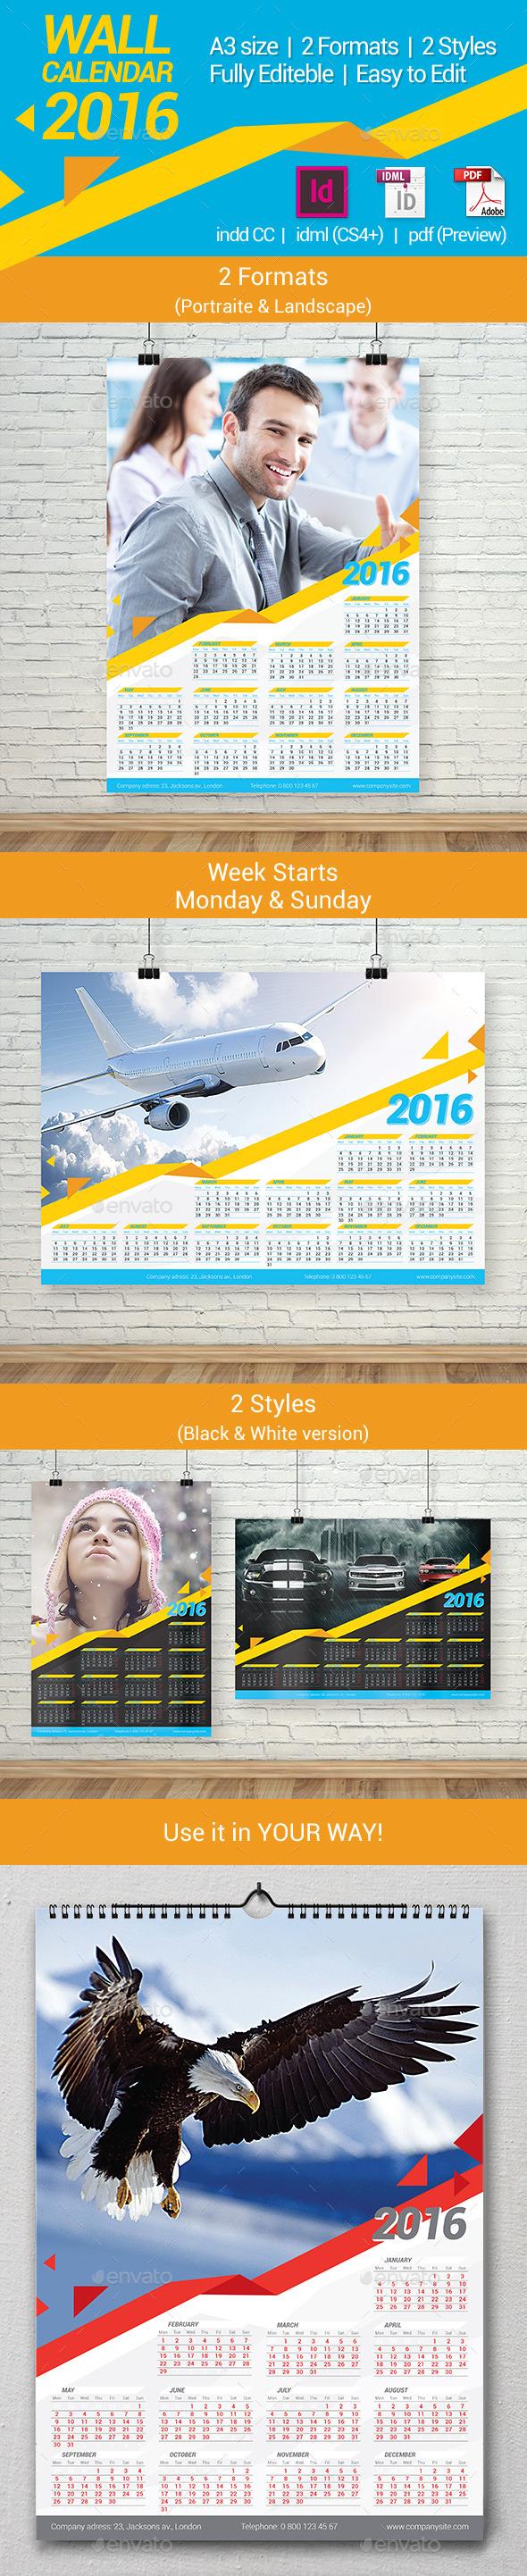 2016 Poster Calendar Template - Calendars Stationery